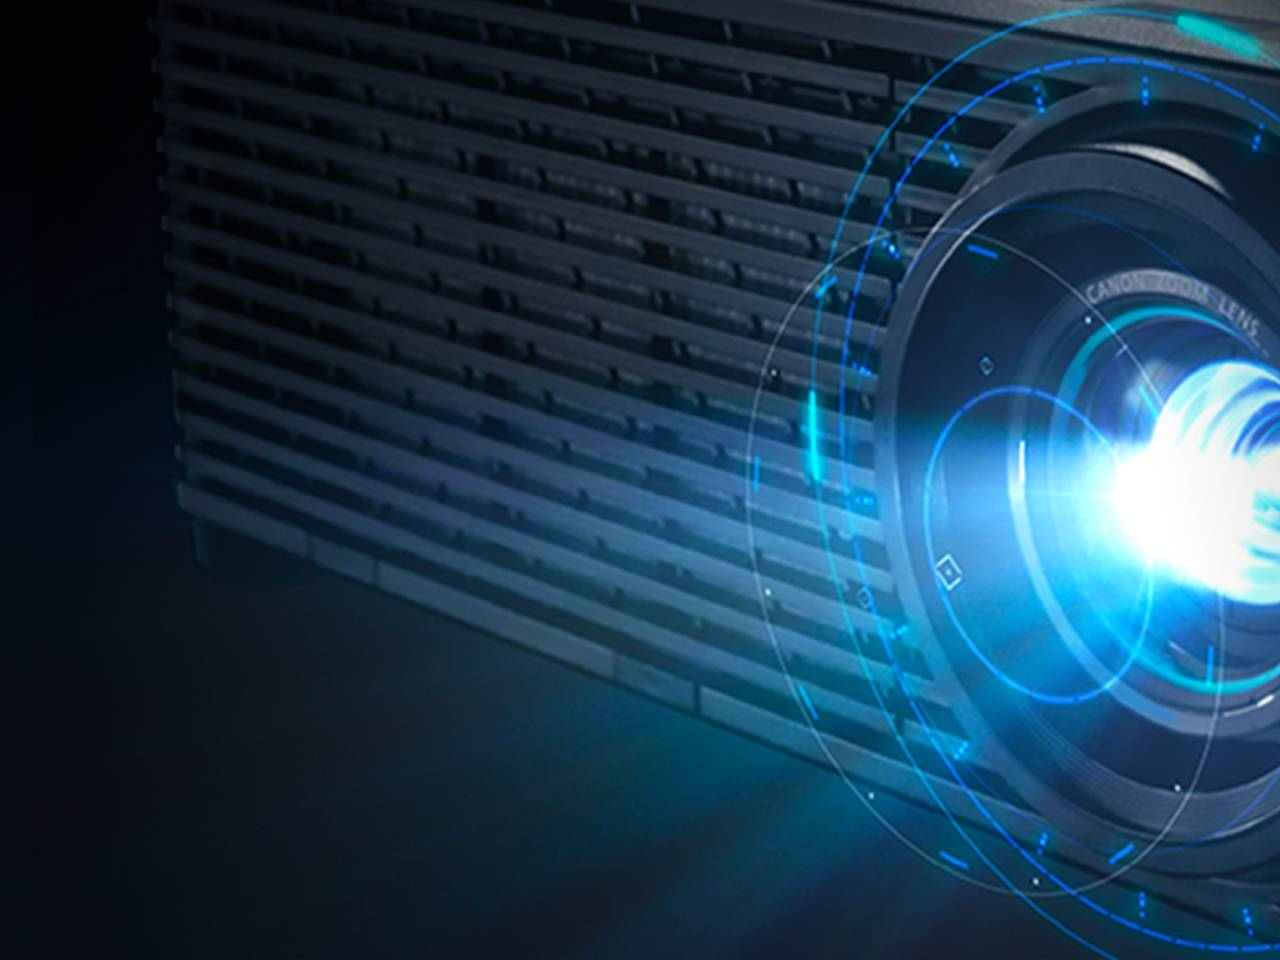 Proyectores canon espa a - Proyectores de luz ...